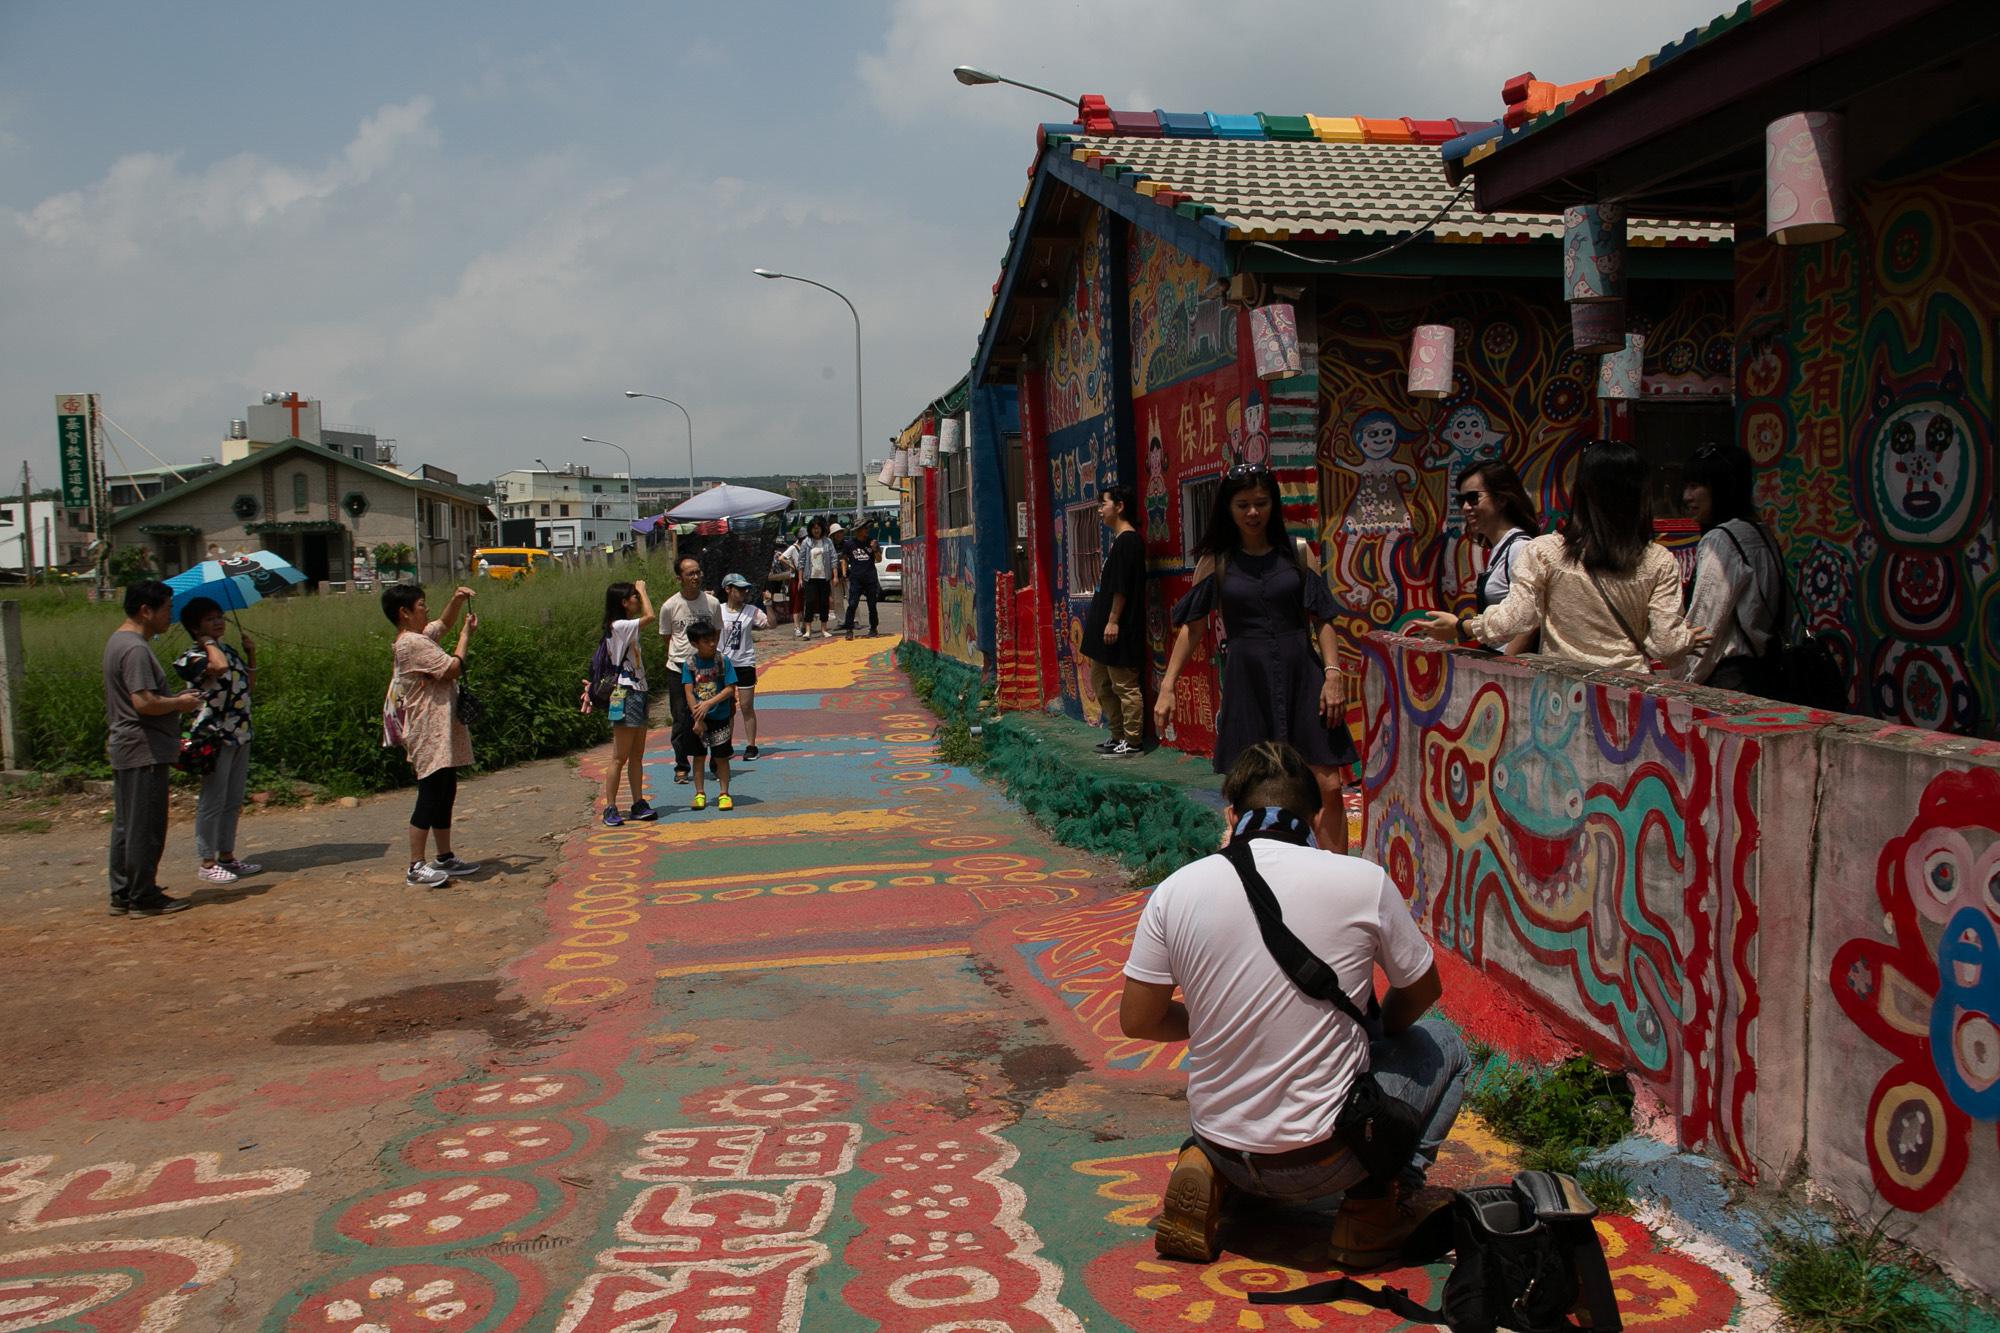 20190508 - Taiwan - Rainbow Village-5.jpg